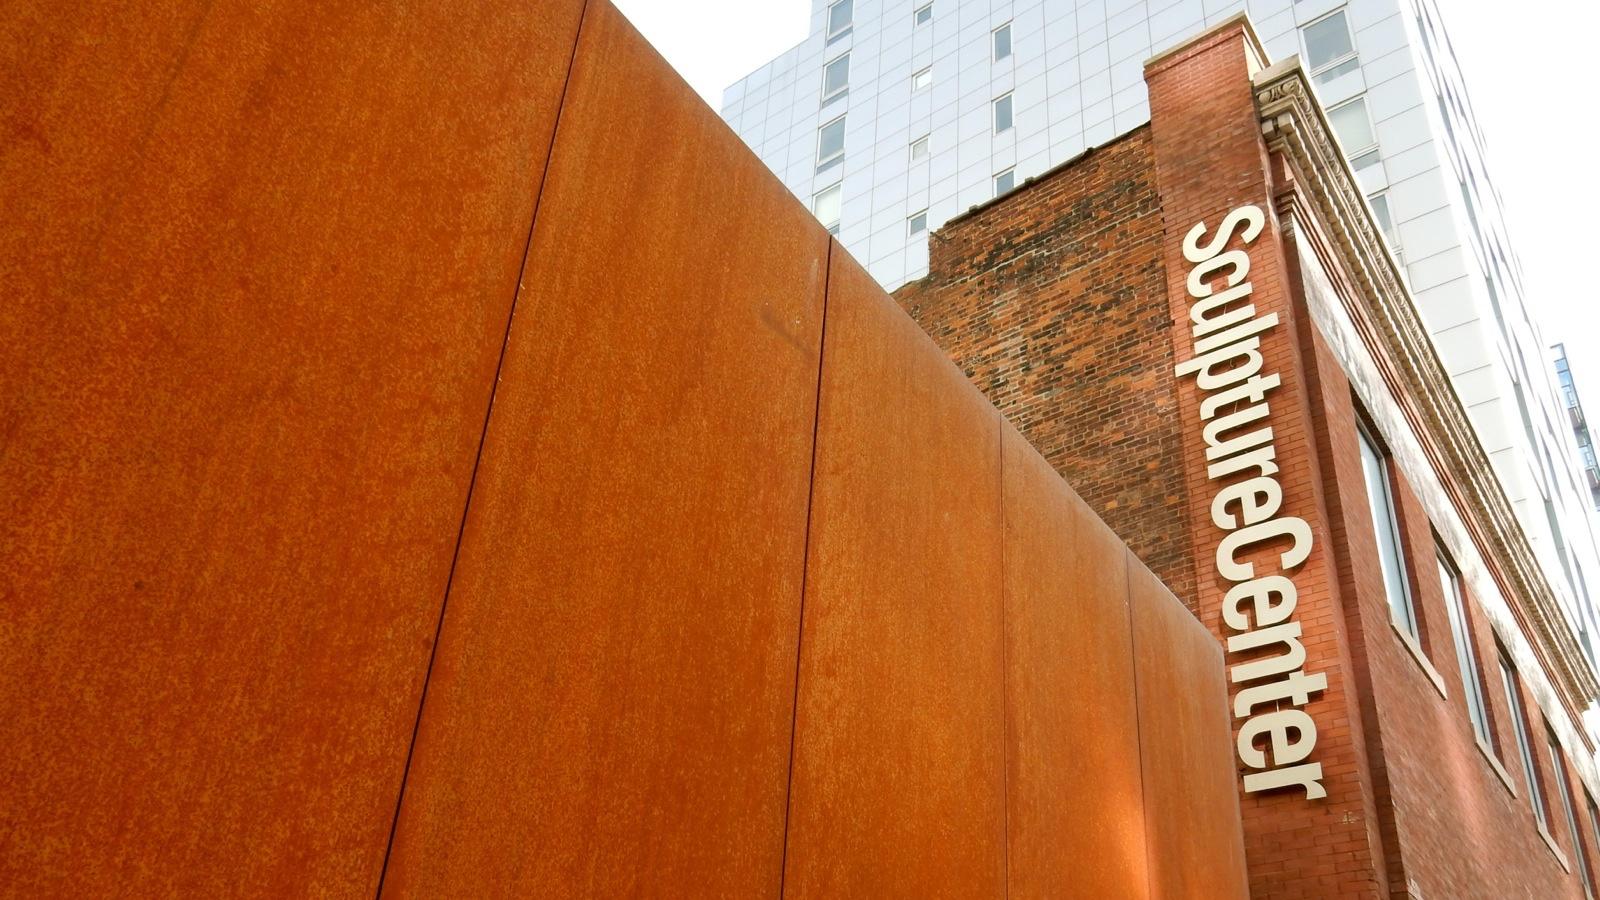 Sculpture-Center-Long-Island-City-NY.jpg